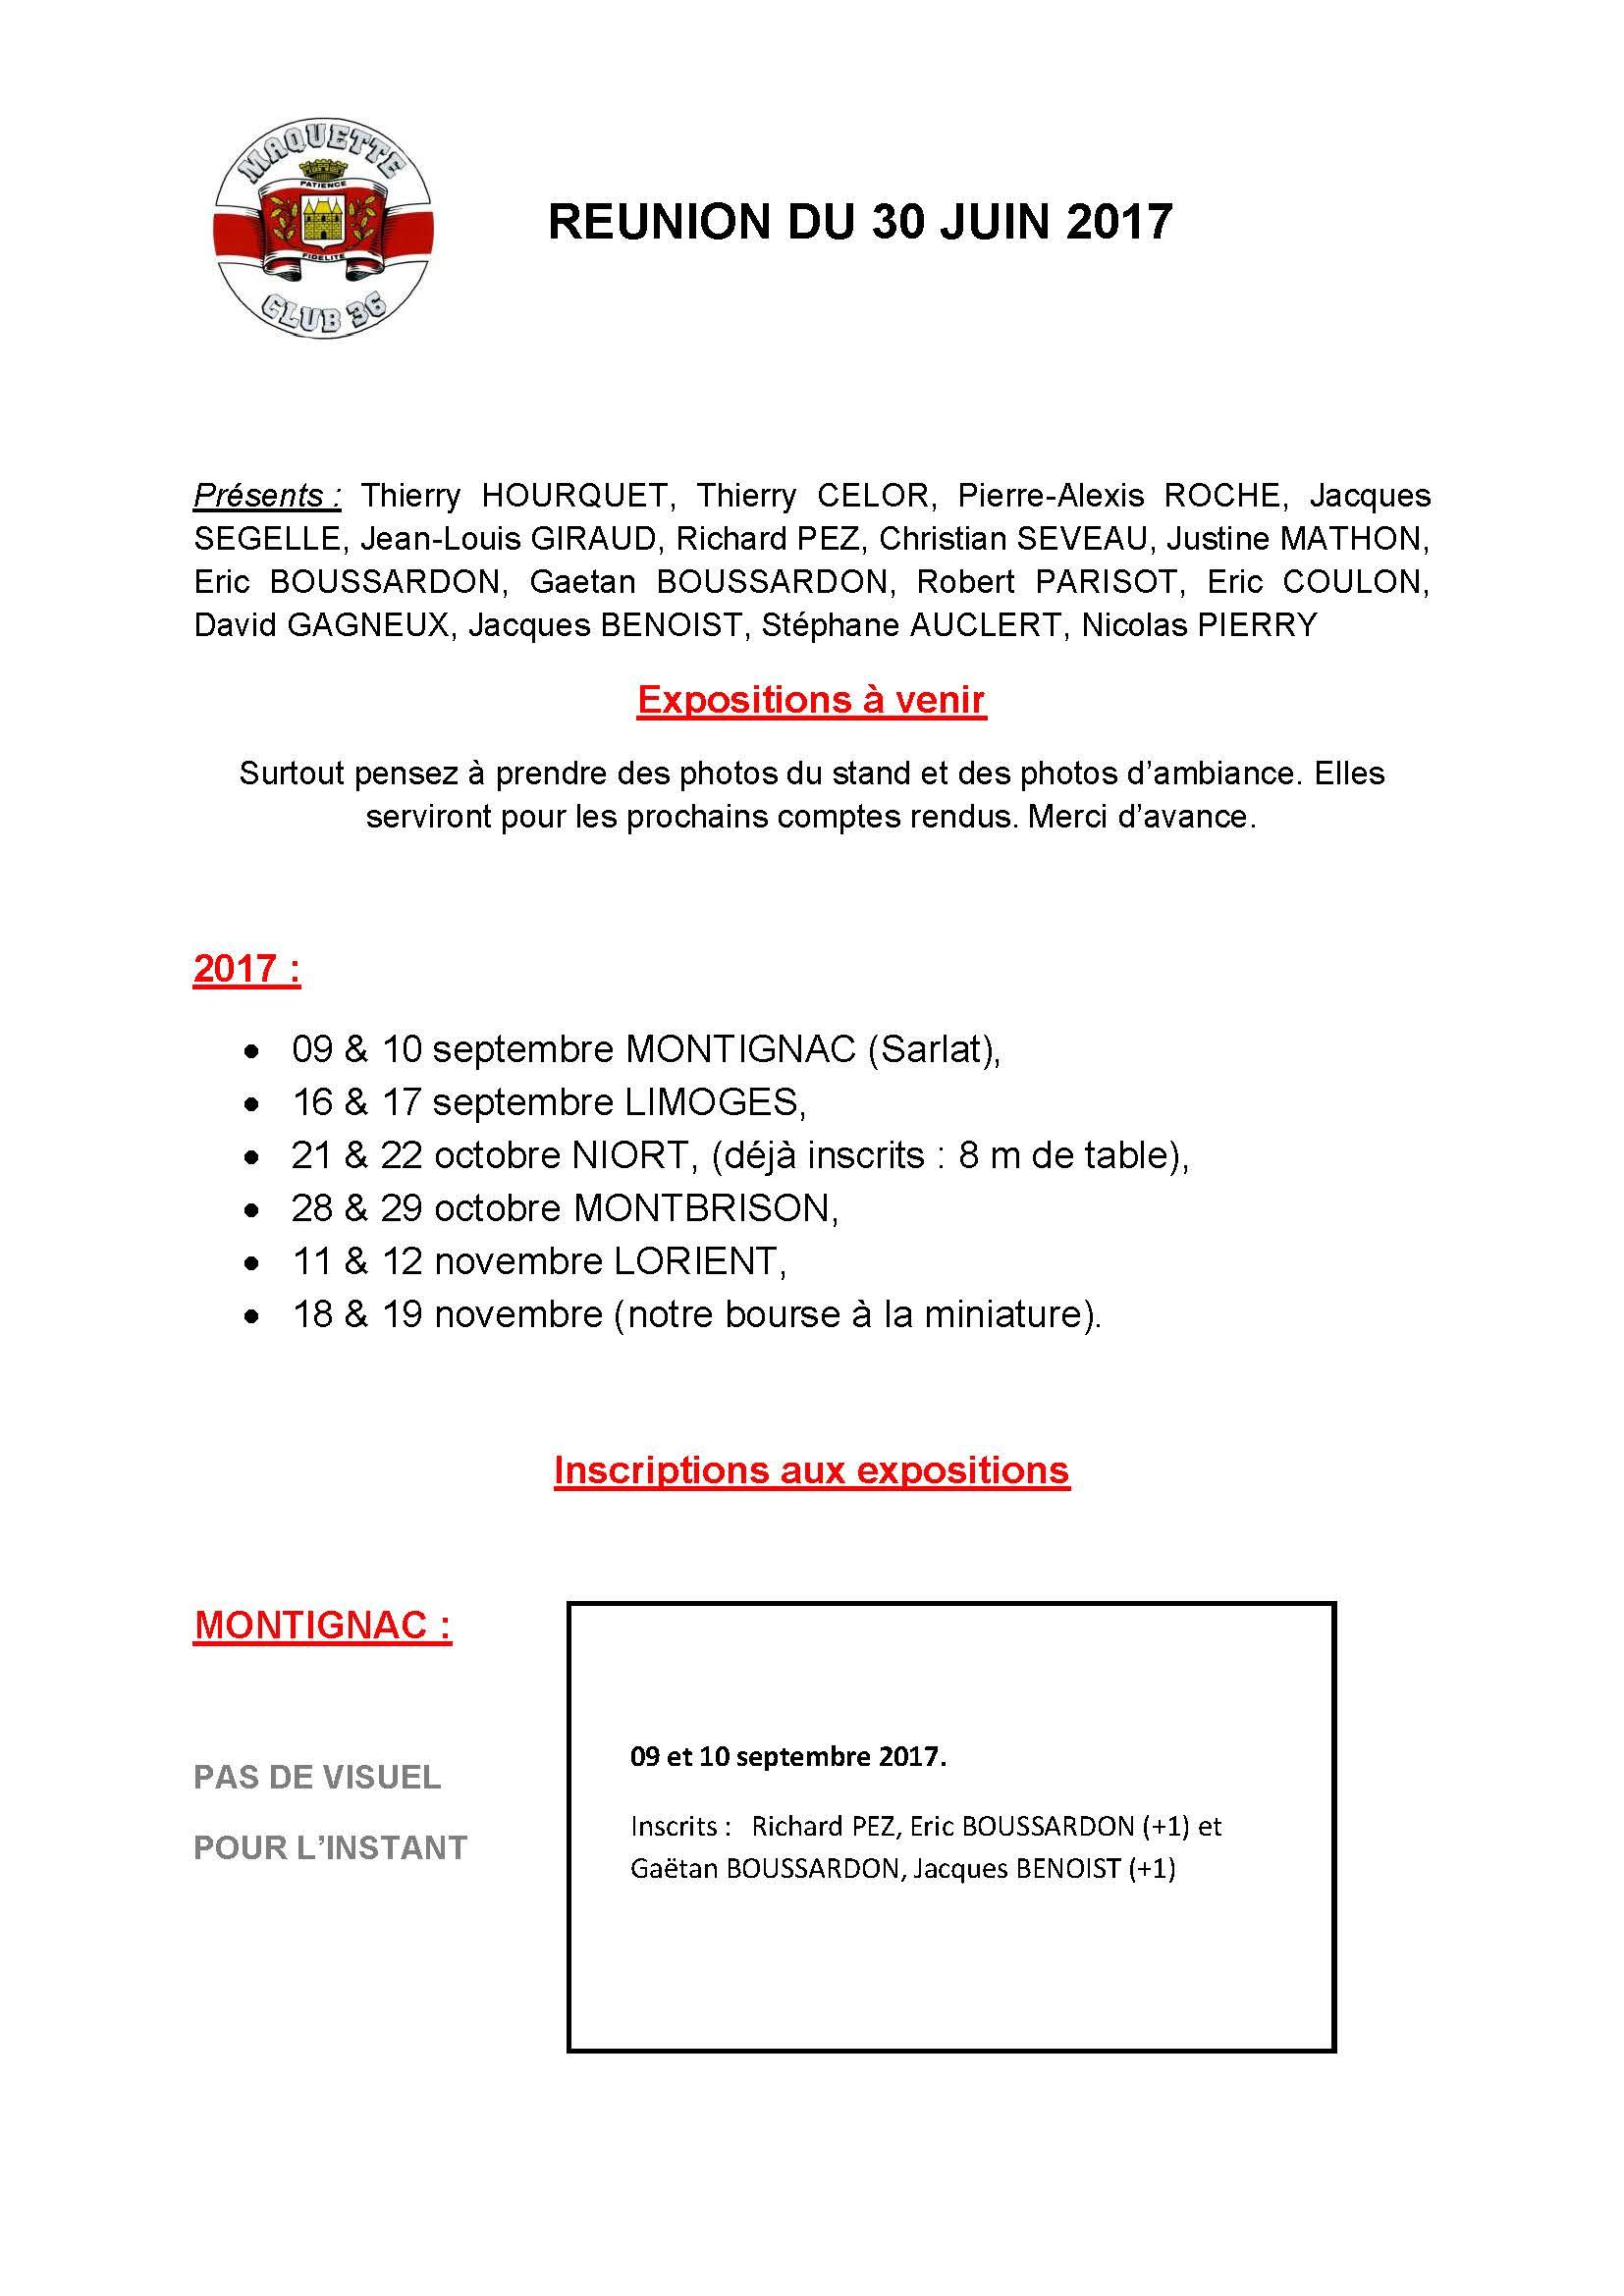 reunion-06.2-2017_page_1